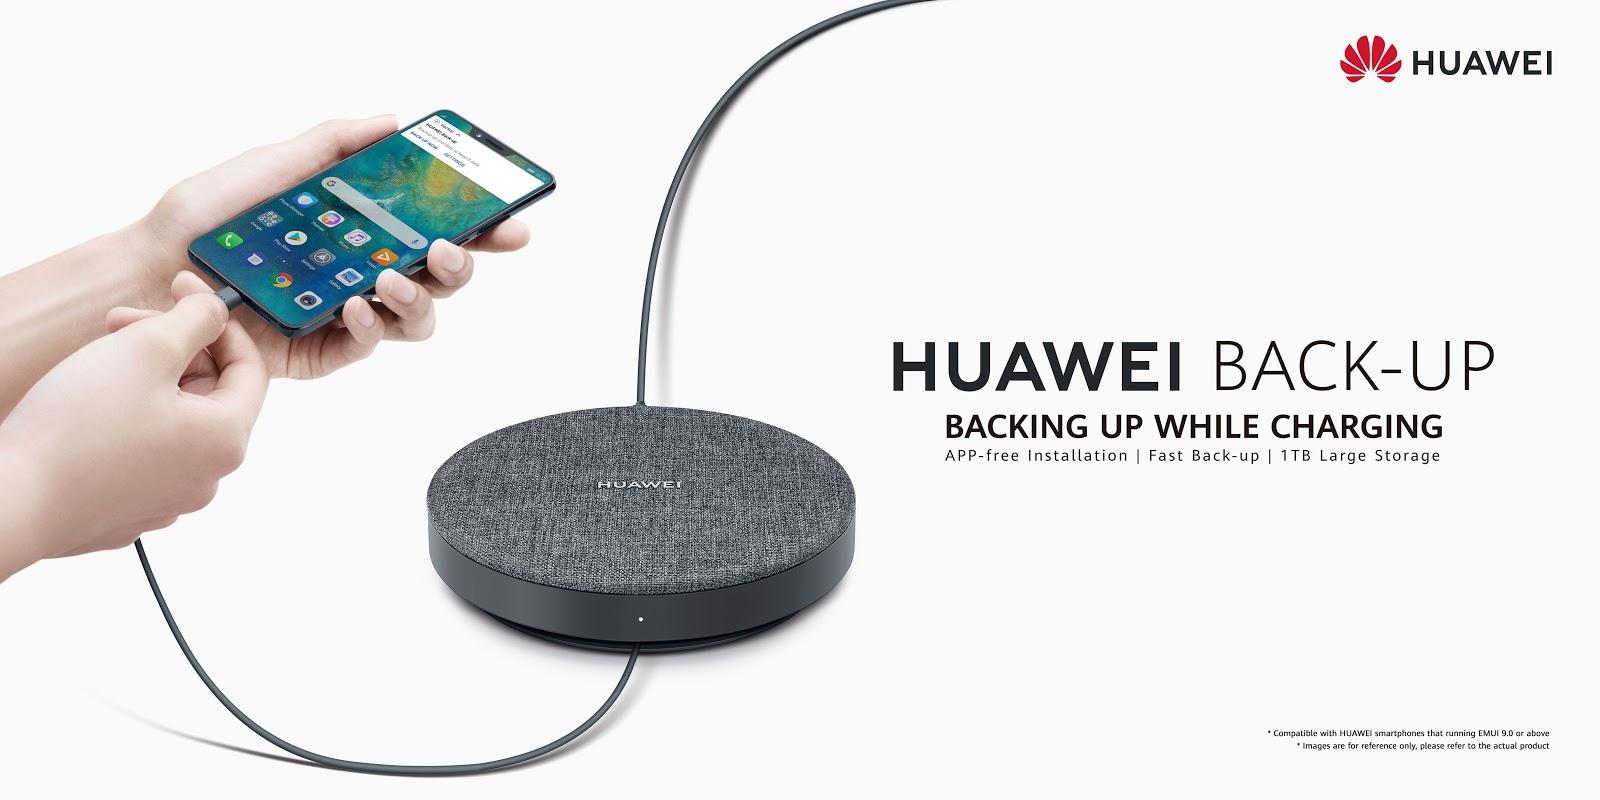 HUAWEI Back-Upอุปกรณ์คู่ใจชิ้นใหม่เพื่อเติมเต็มไลฟ์สไตล์มากขึ้น  หมดปัญหา!ไฟล์เยอะ เมมเต็ม เครื่องเดียวเอาอยู่